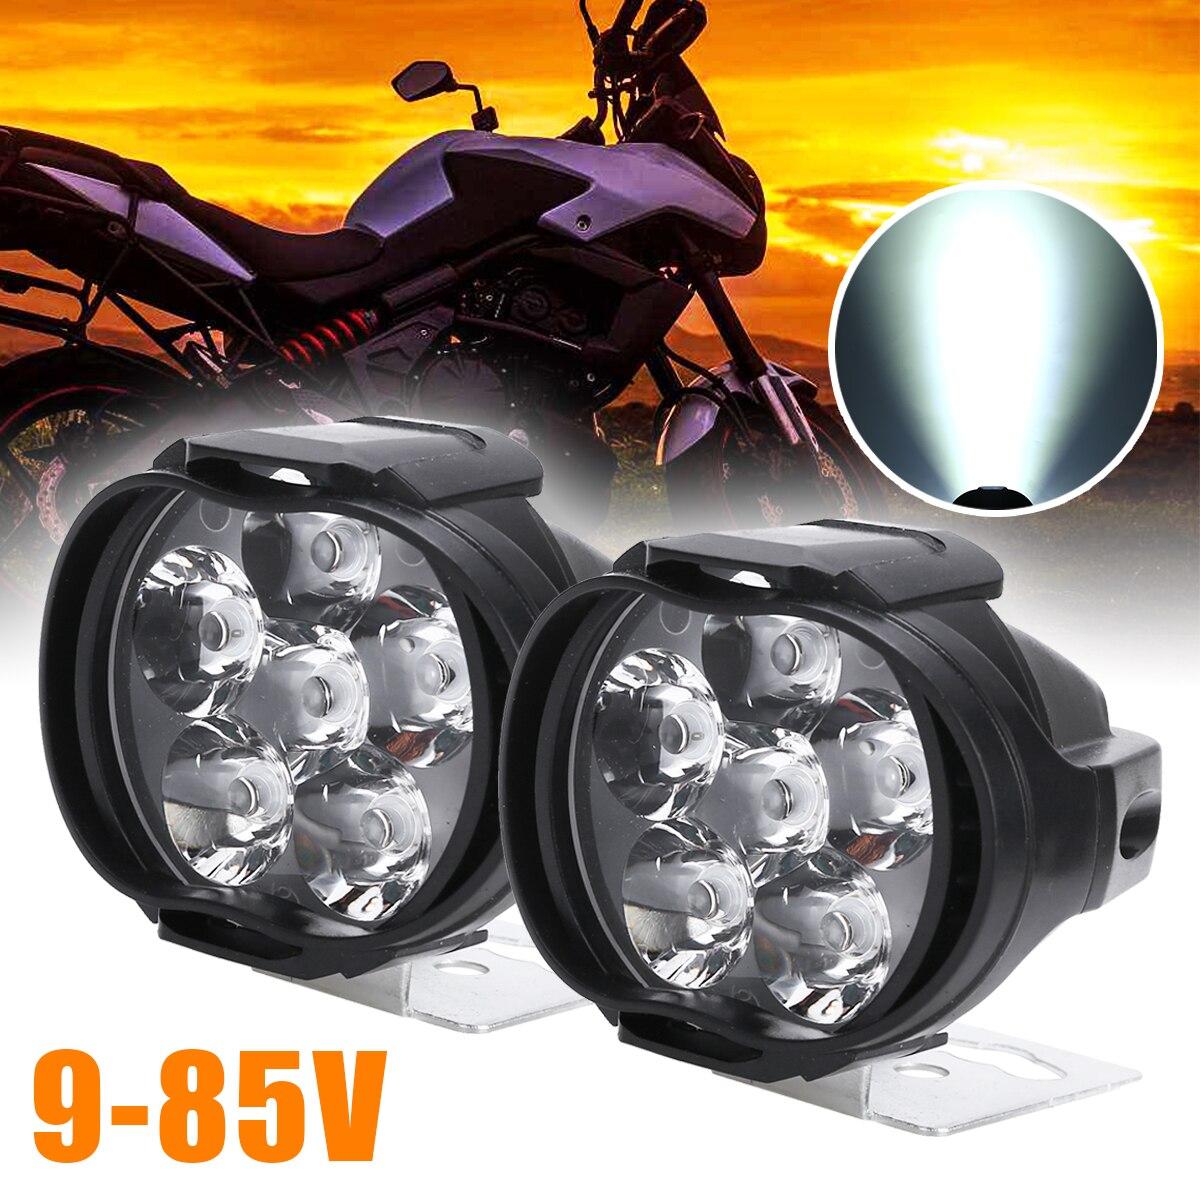 Universal 2 uds motocicleta faro Scooter luz antiniebla LED motocicleta ATV Moto trabajo cabeza lámpara blanca DRL coche faro